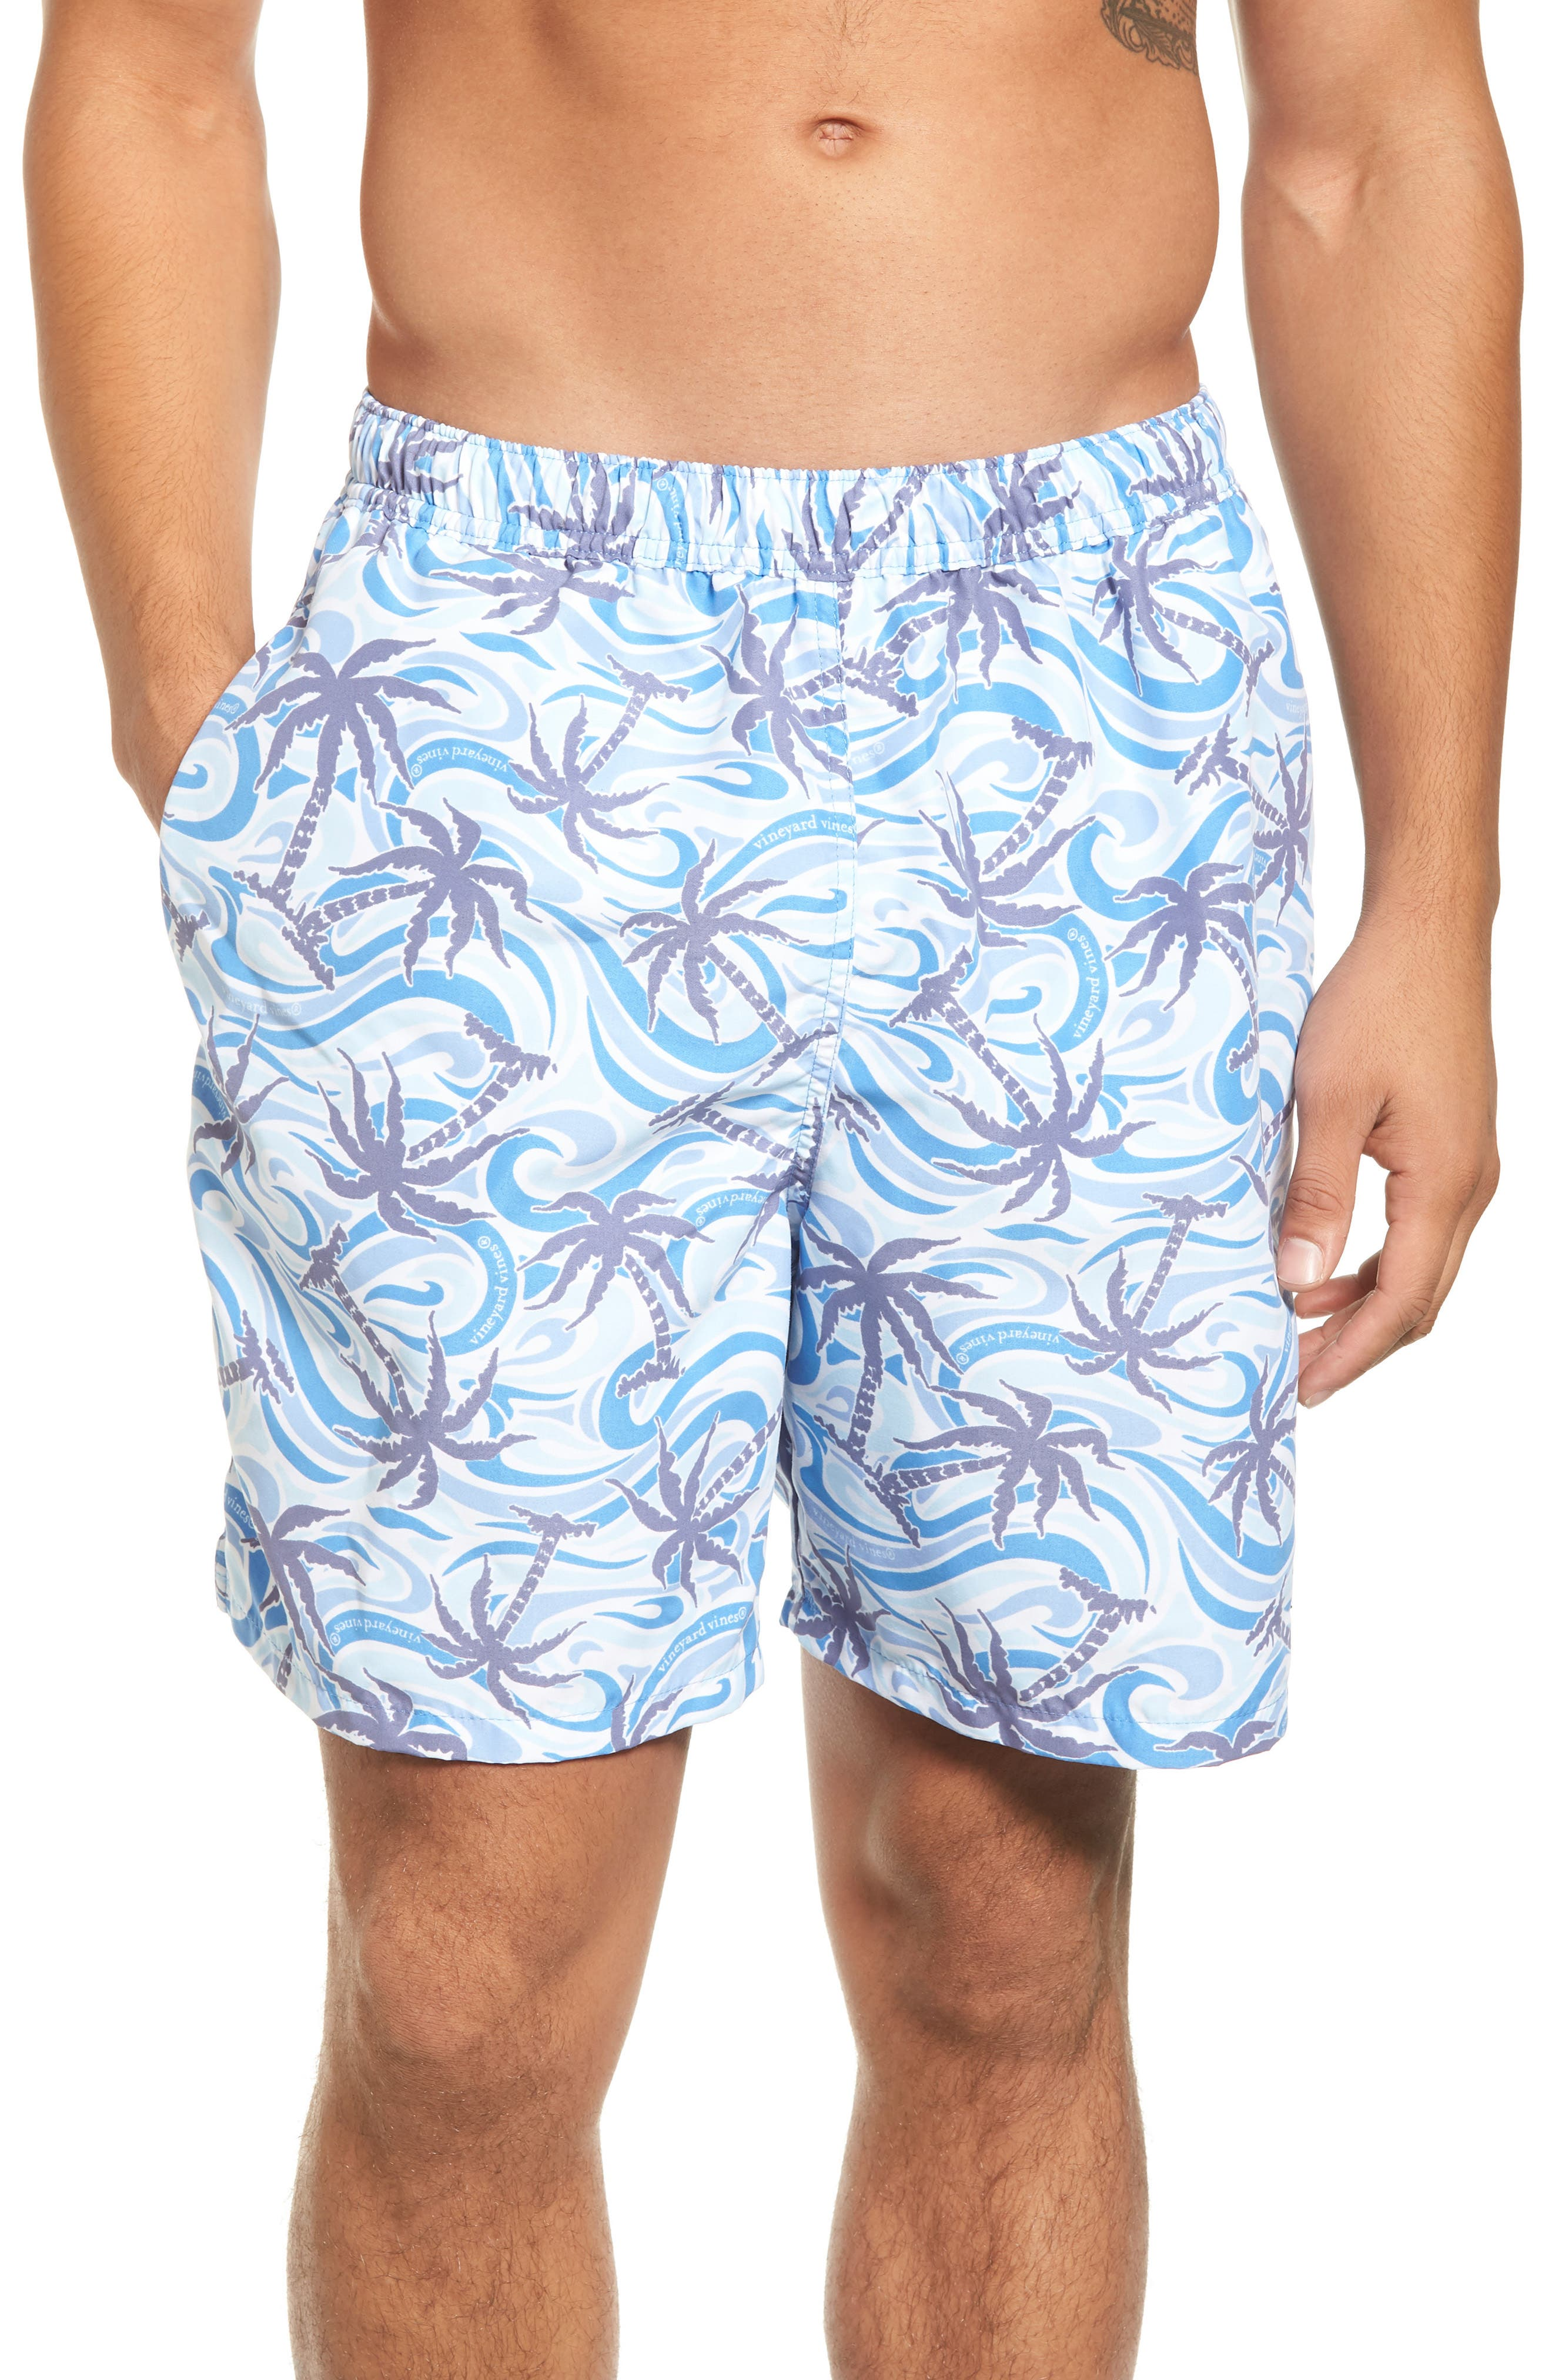 Chappy Wave Palm Tree Swim Trunks,                         Main,                         color, Jake Blue